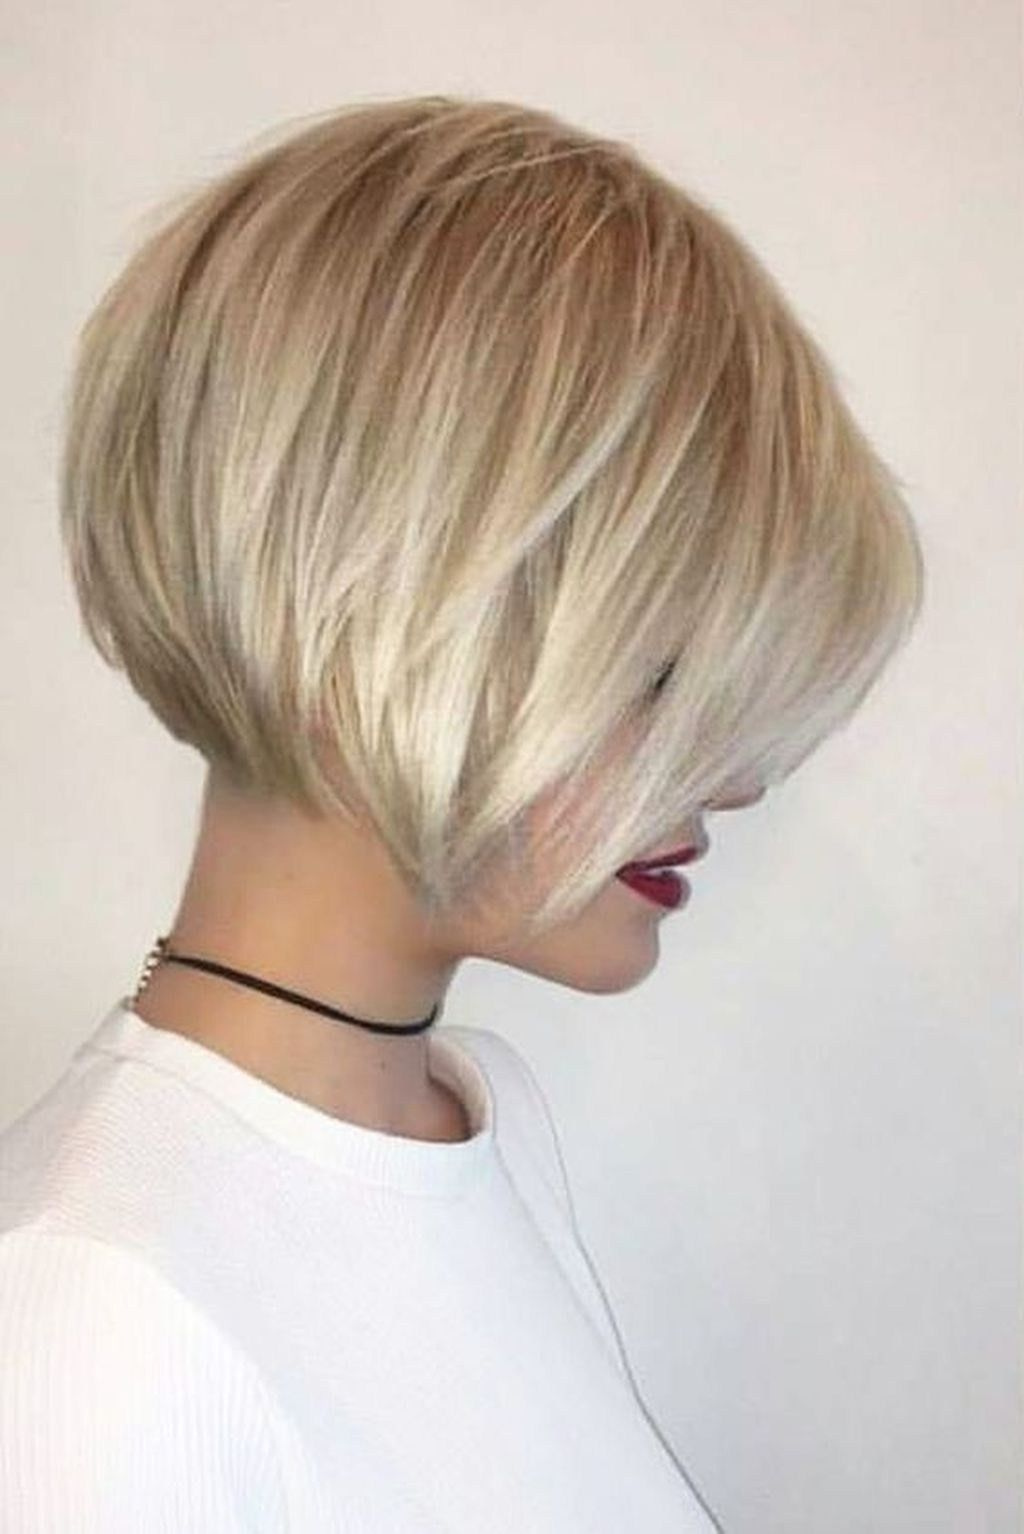 Pin by ALIA MAISARAH on Hair Girl  Thick hair styles, Short hair